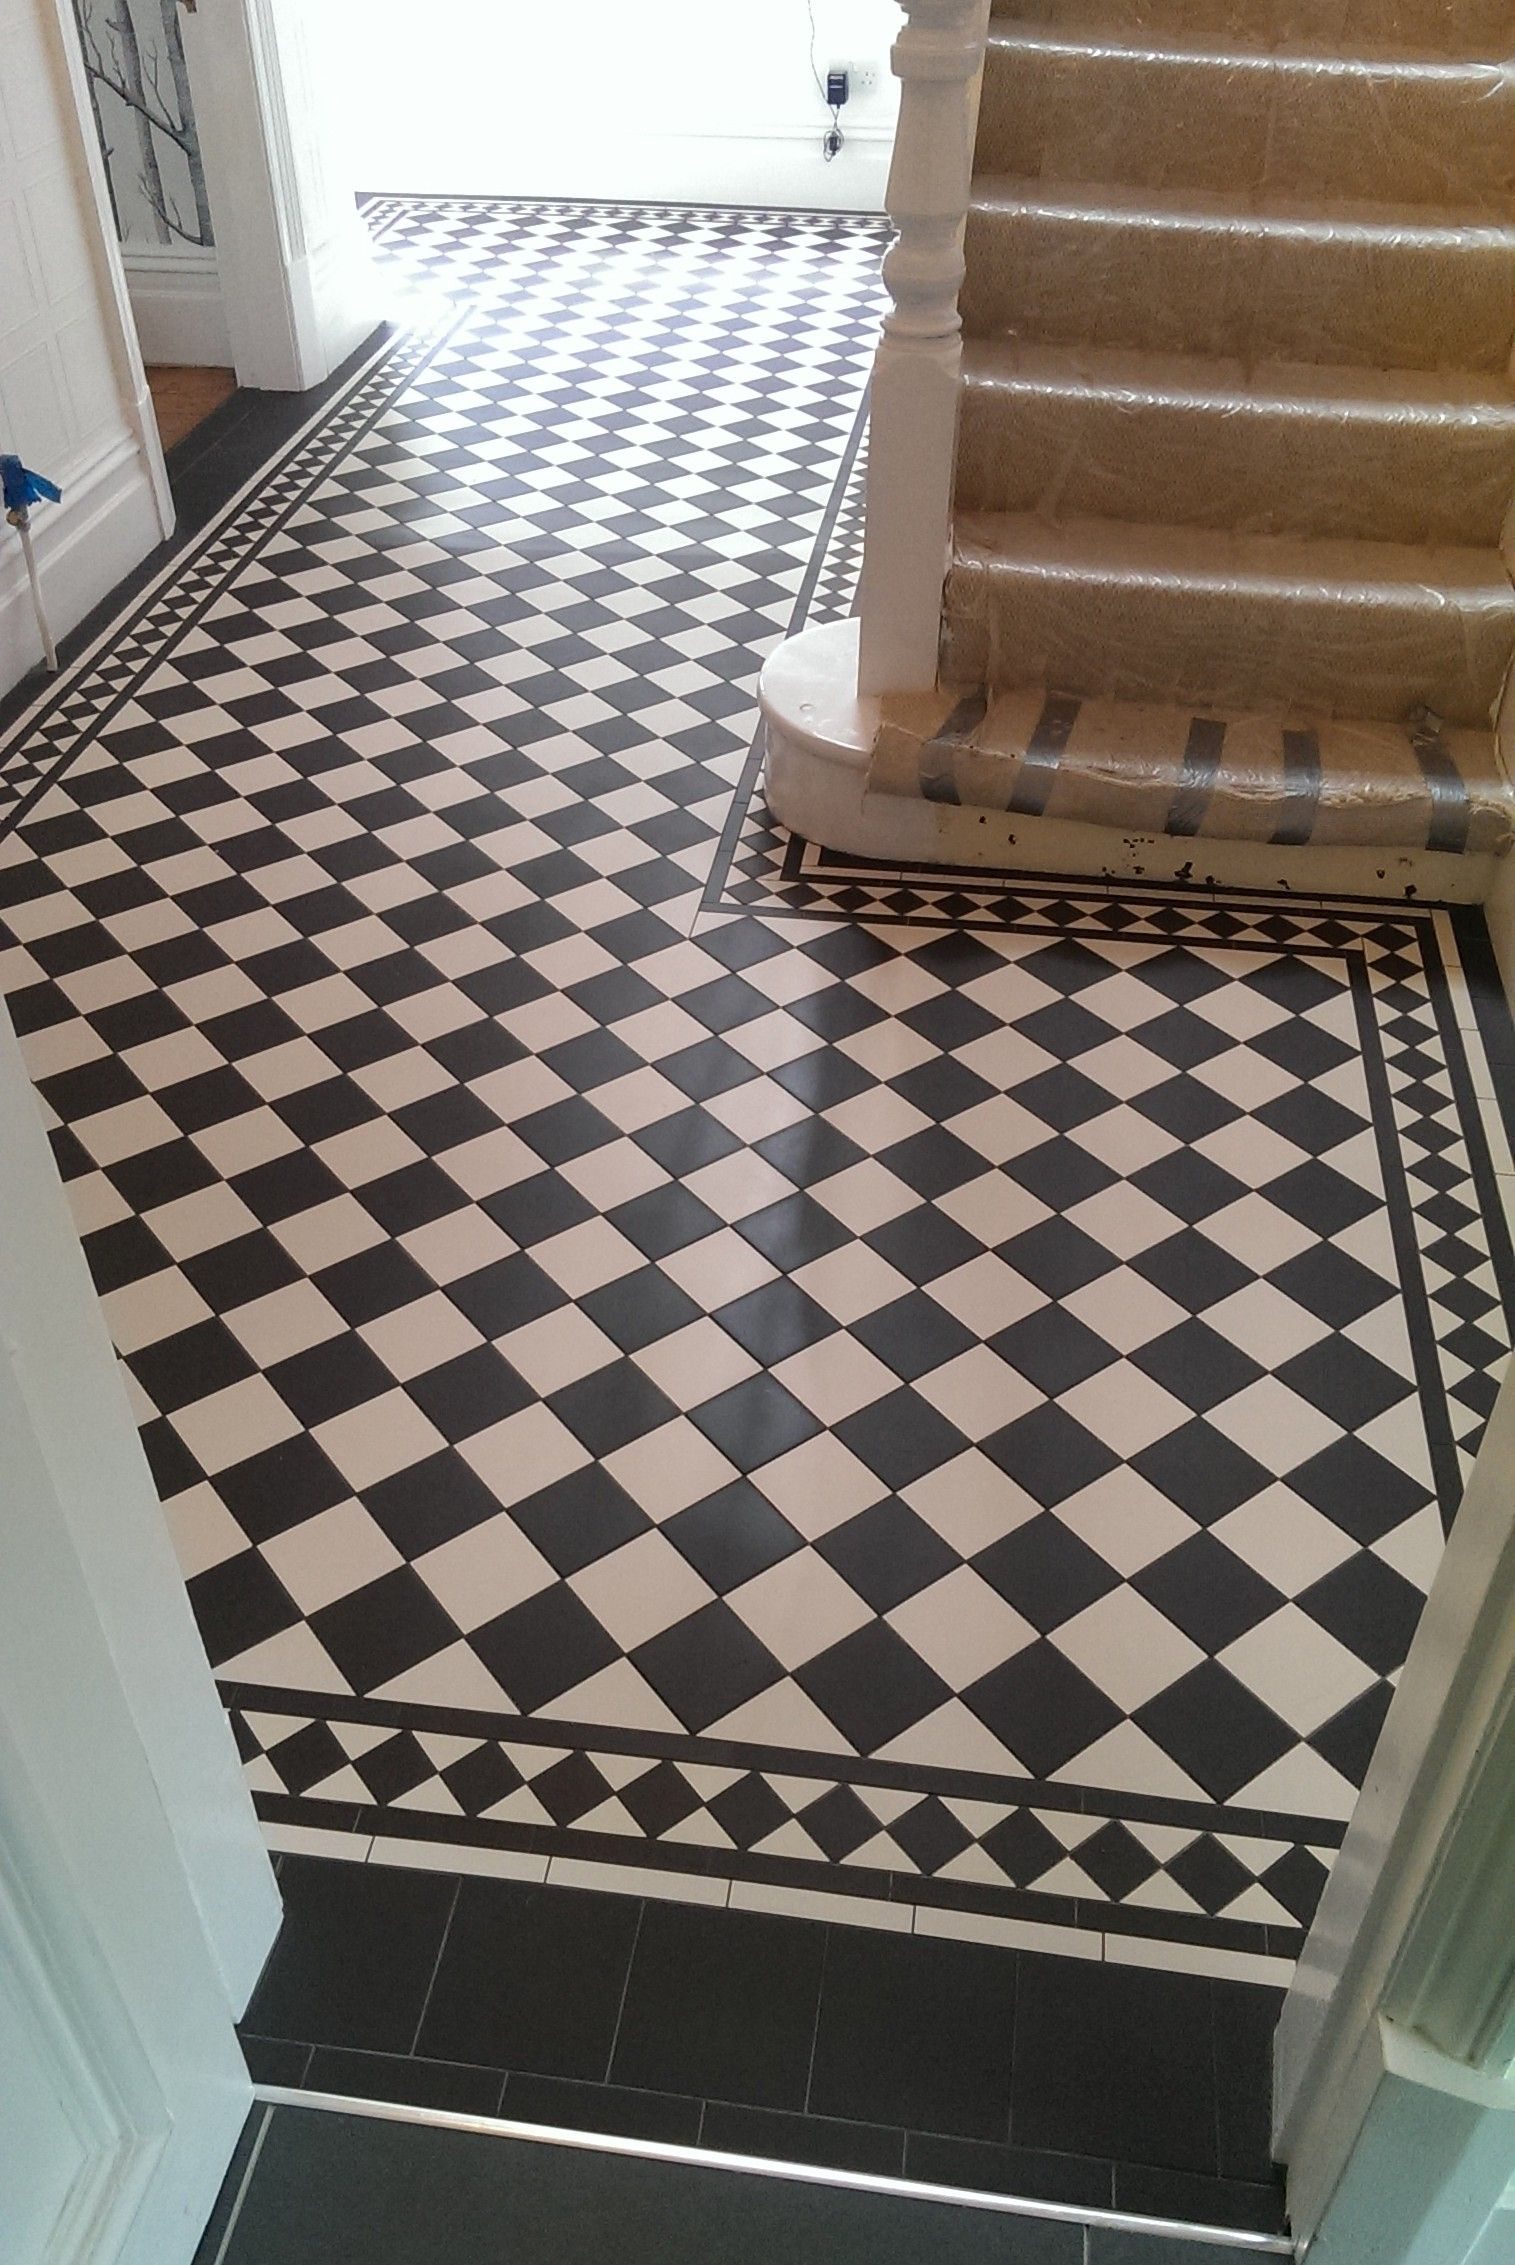 Victorian floor tiles gallery original style floors period victorian floor tiles gallery original style floors period floors dailygadgetfo Image collections